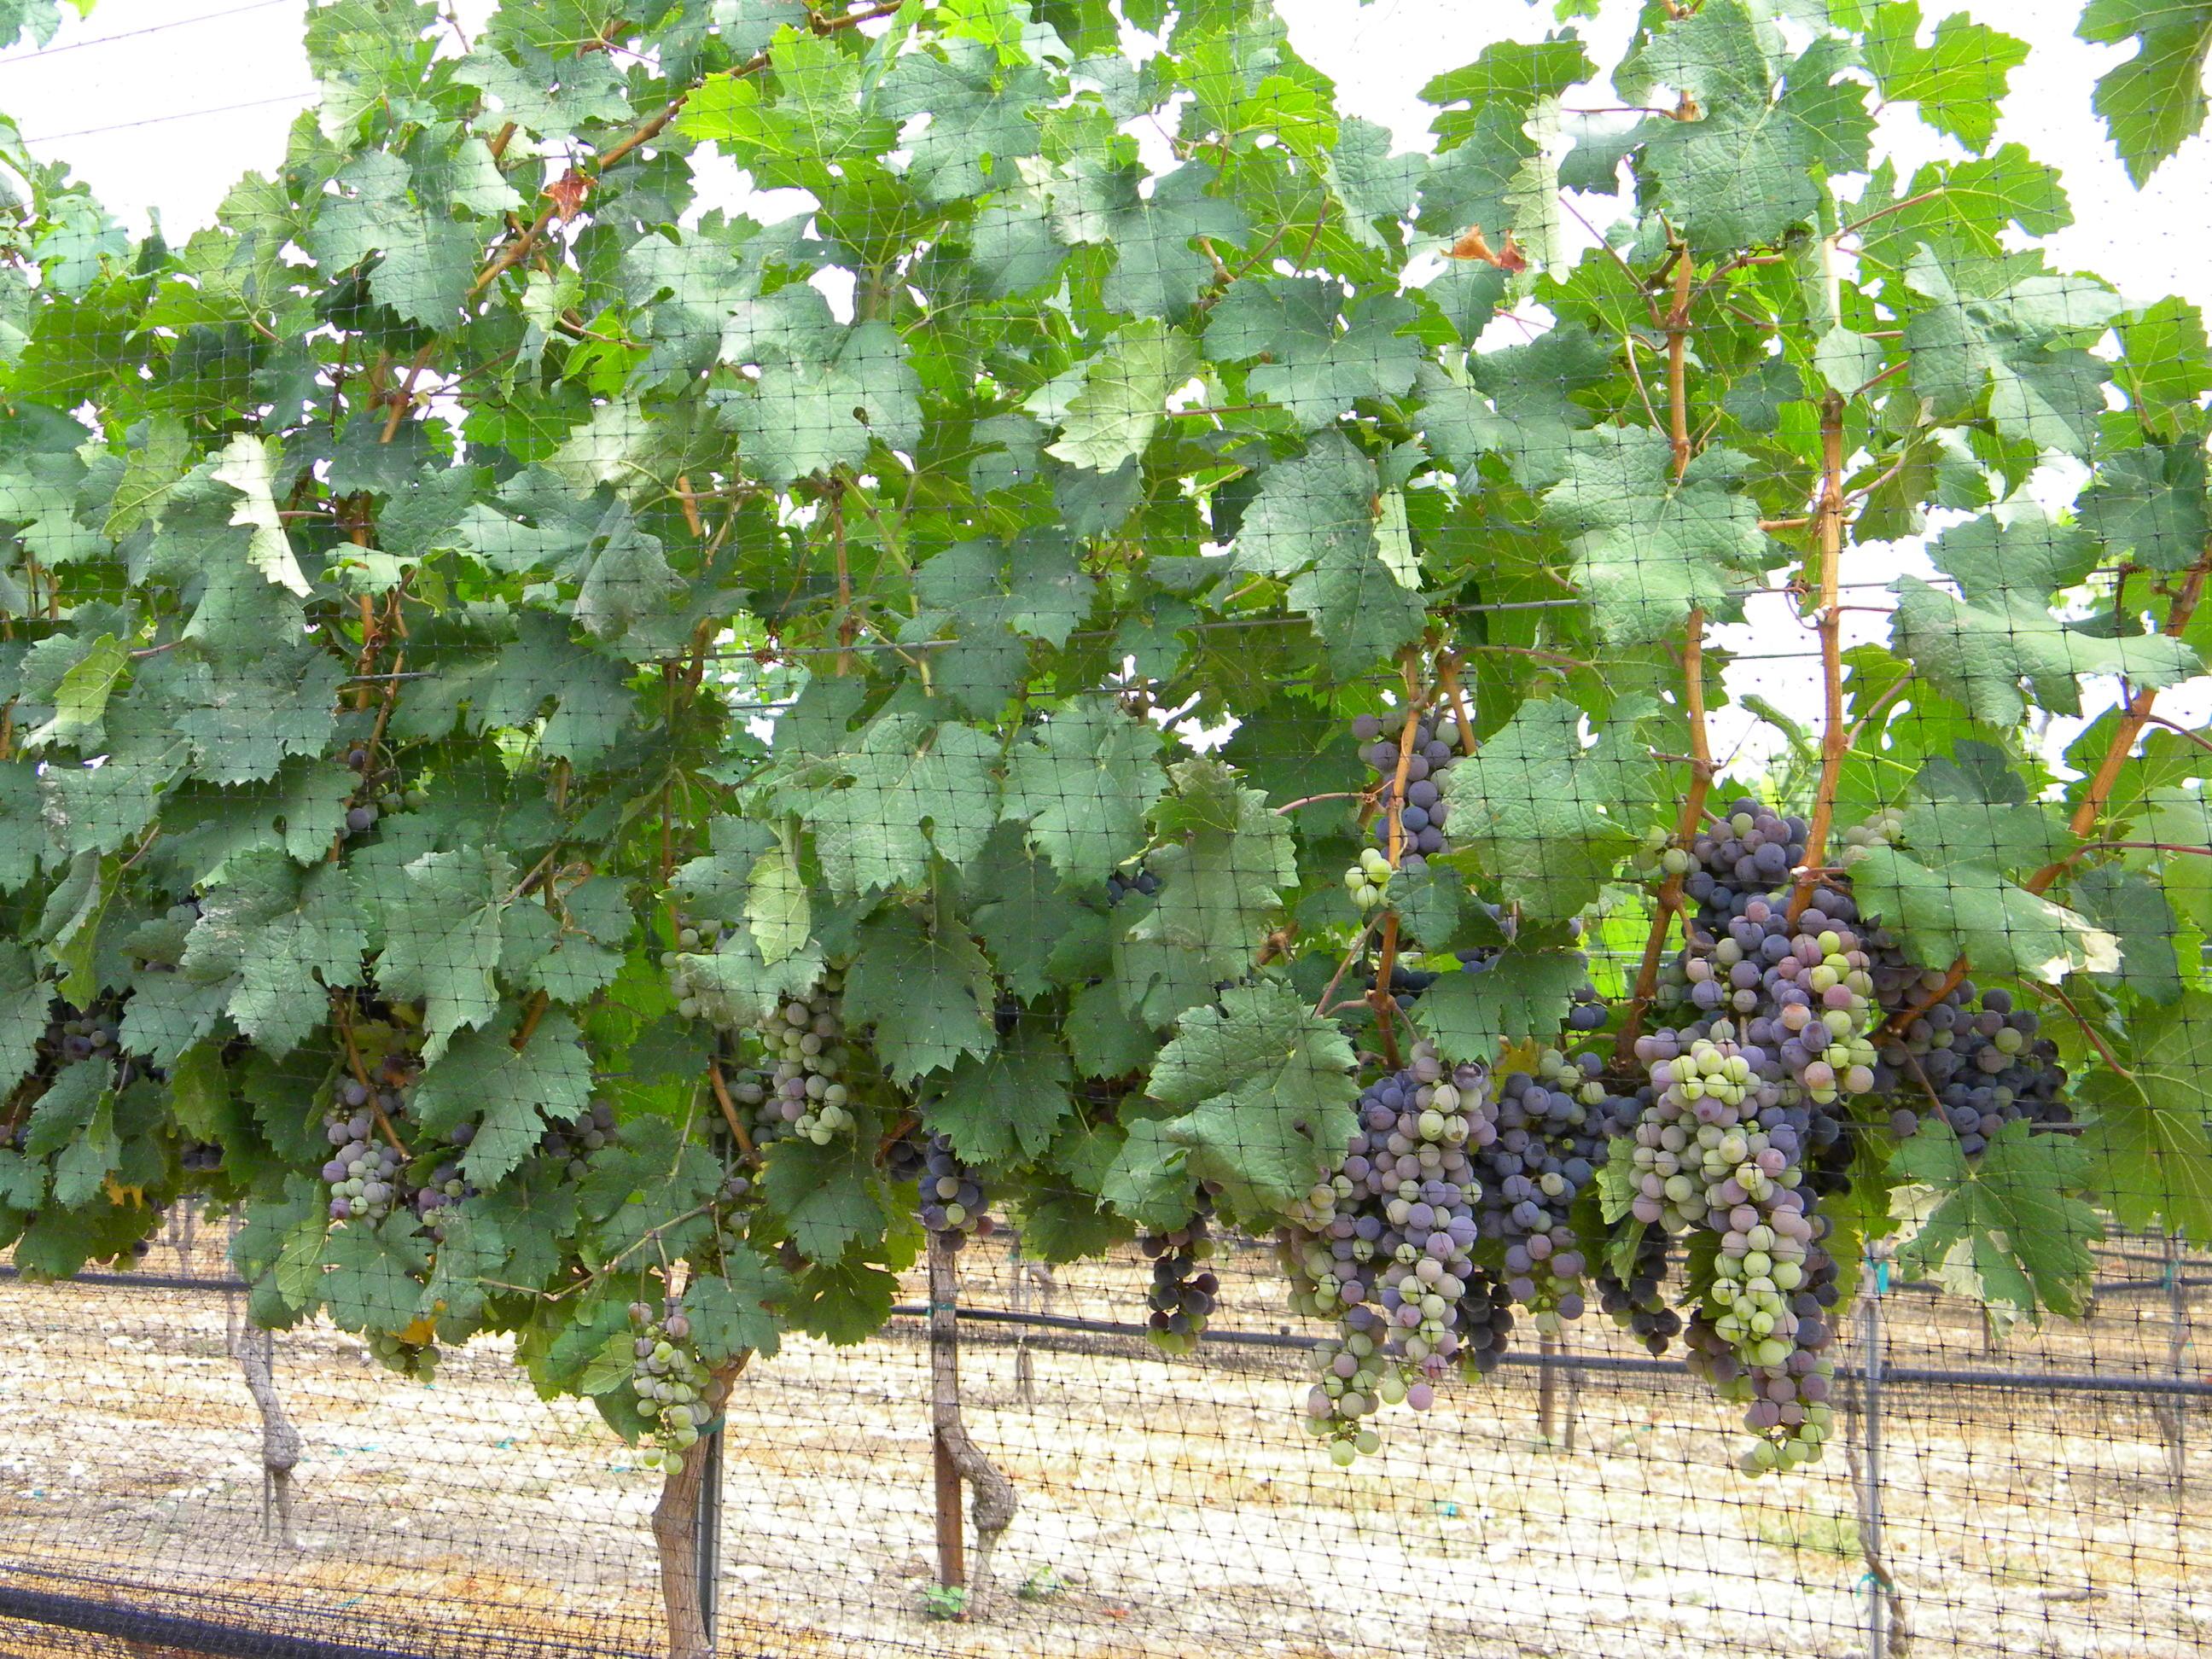 Vineyard supplies and equipment